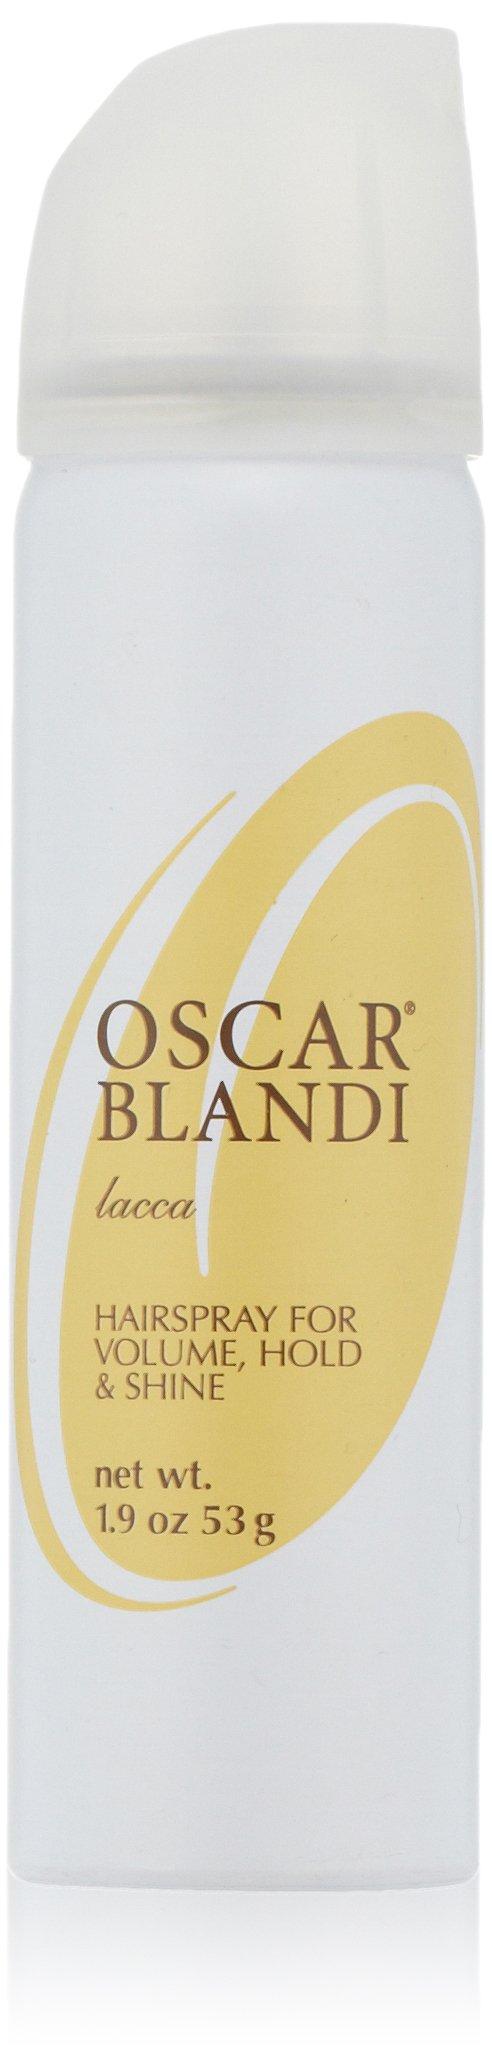 Oscar Blandi Lacca Hairspray for Volume, Hold & Shine, 1.9 oz.